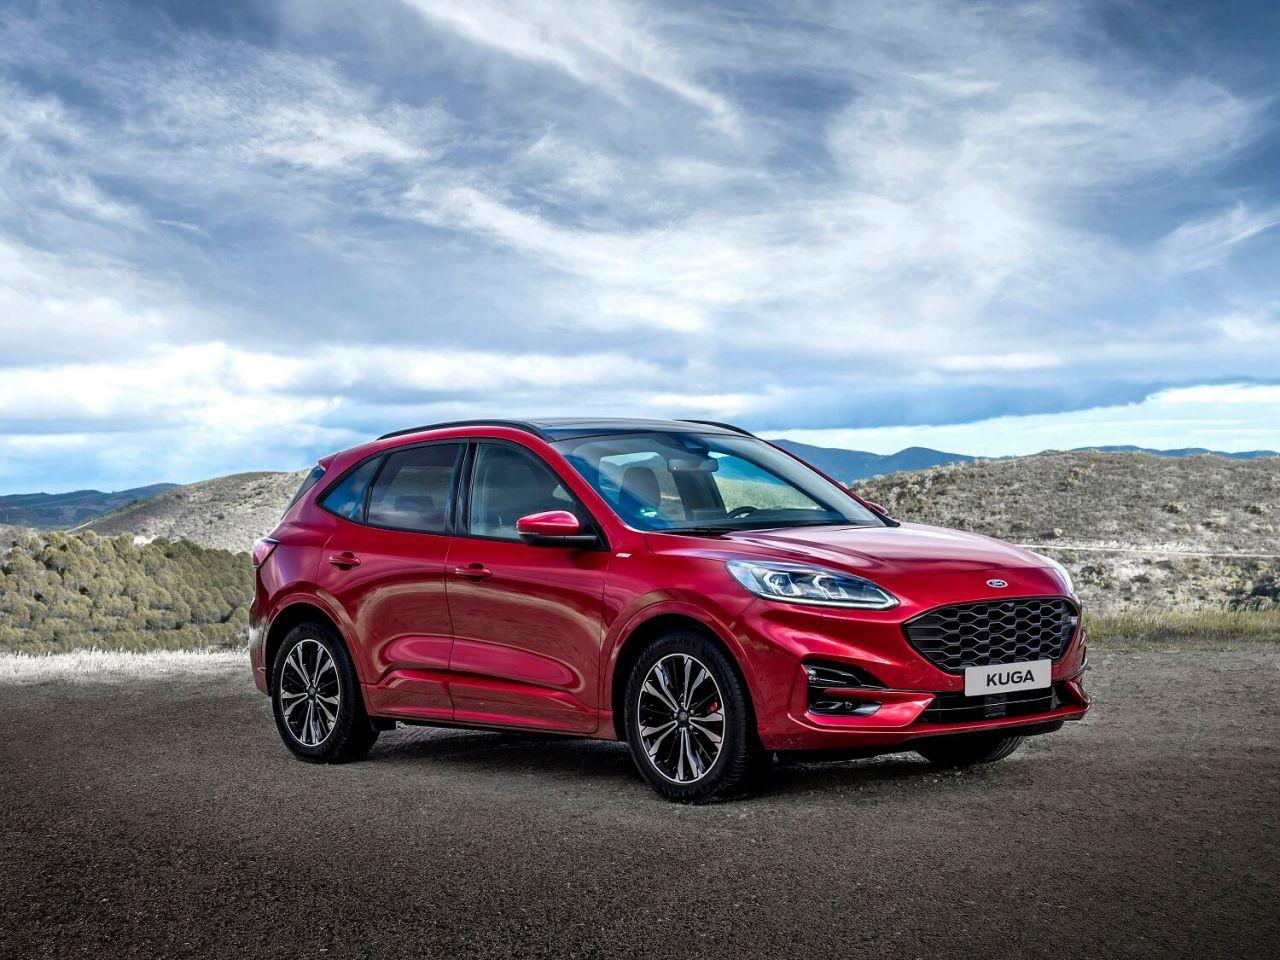 2021 Ford Kuga güncel fiyat listesi! İşte size fırsat! - Page 2